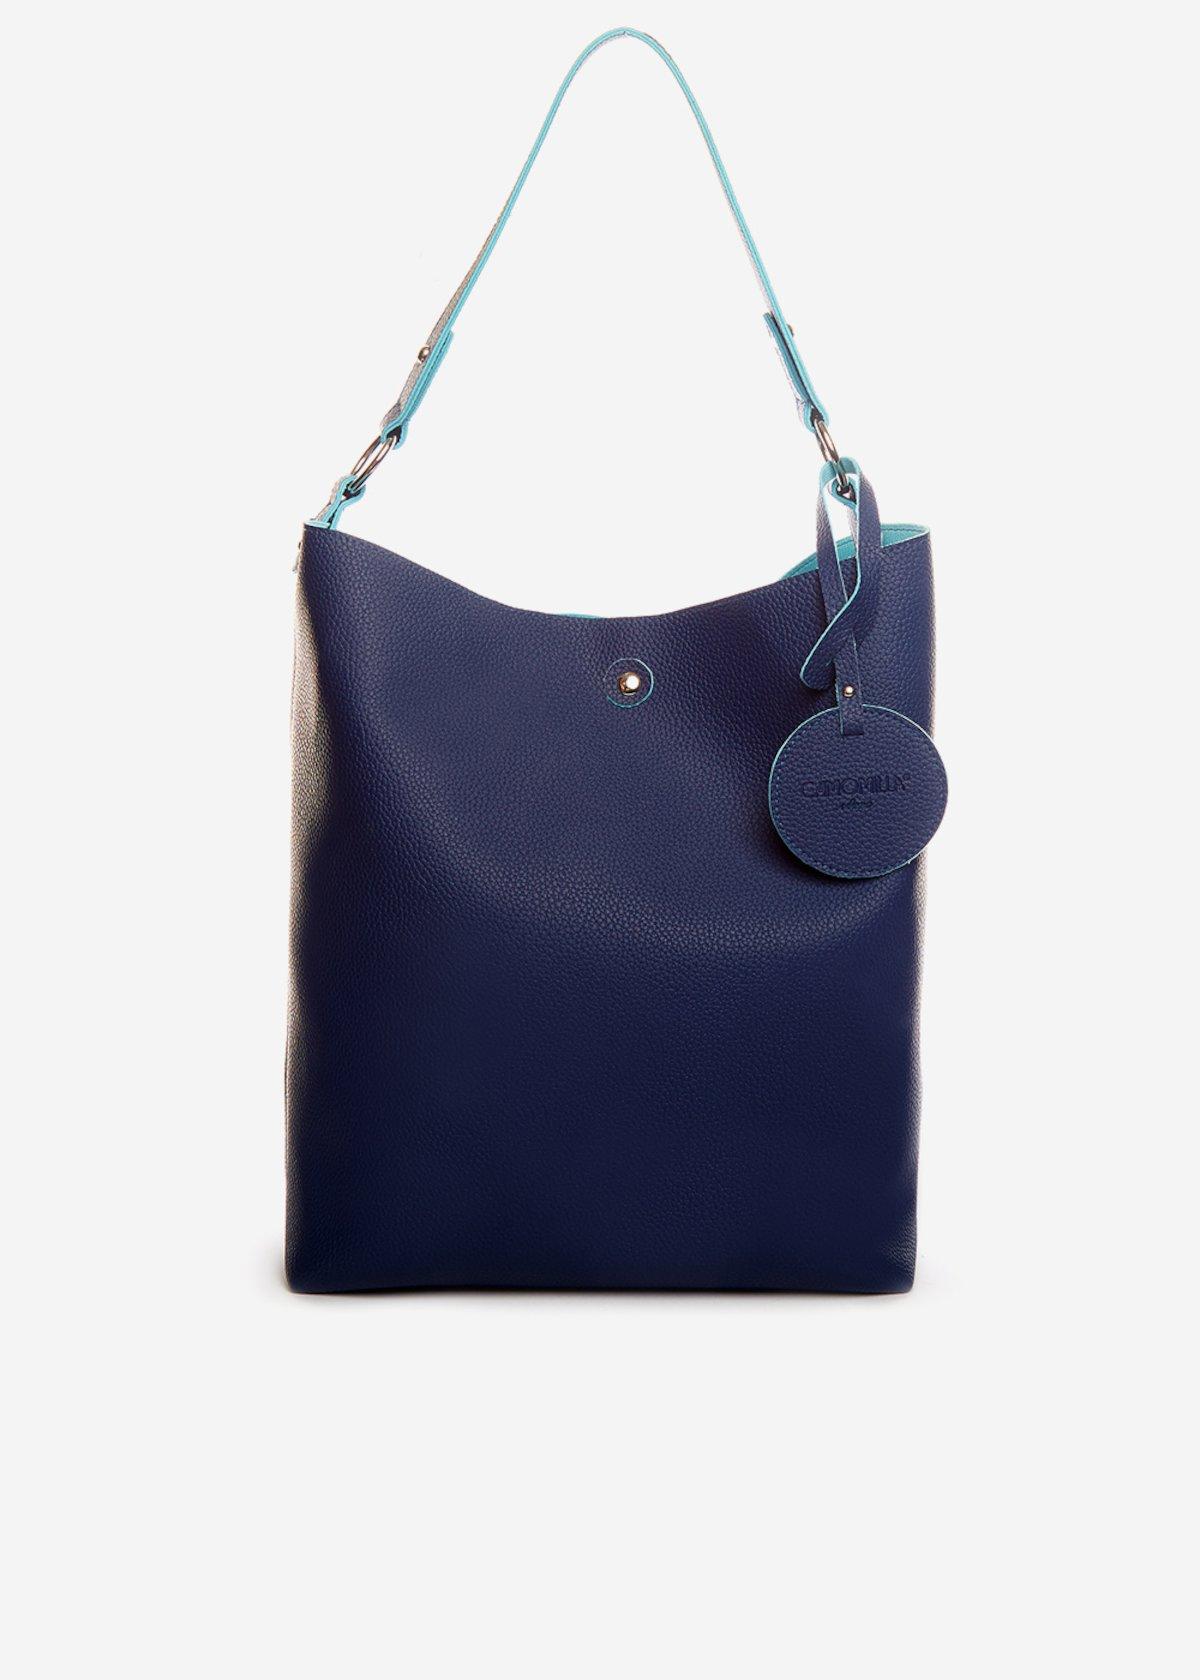 Faux leather double material Briglia shopping bag - Medium Blue